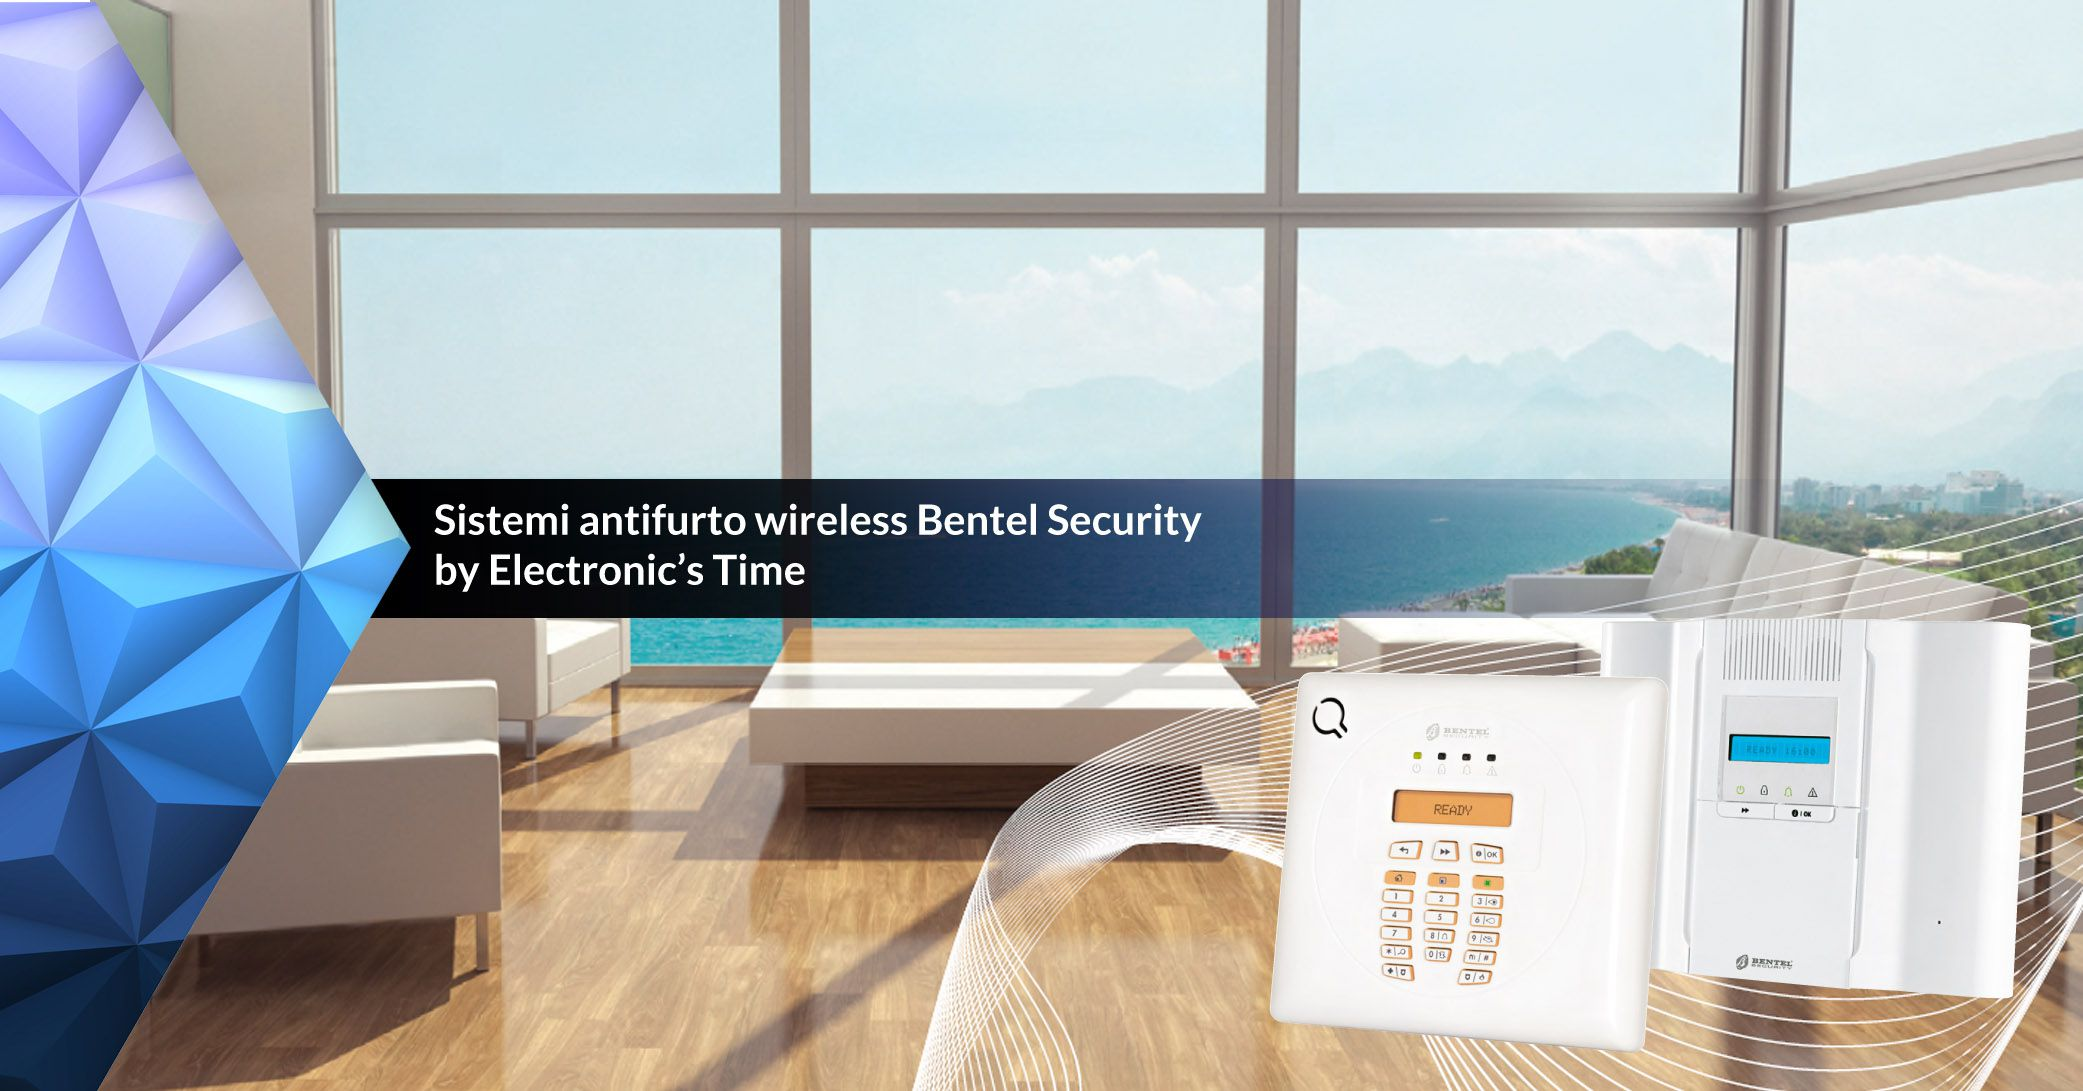 ANTIFURTO WIRELESS BENTEL Security